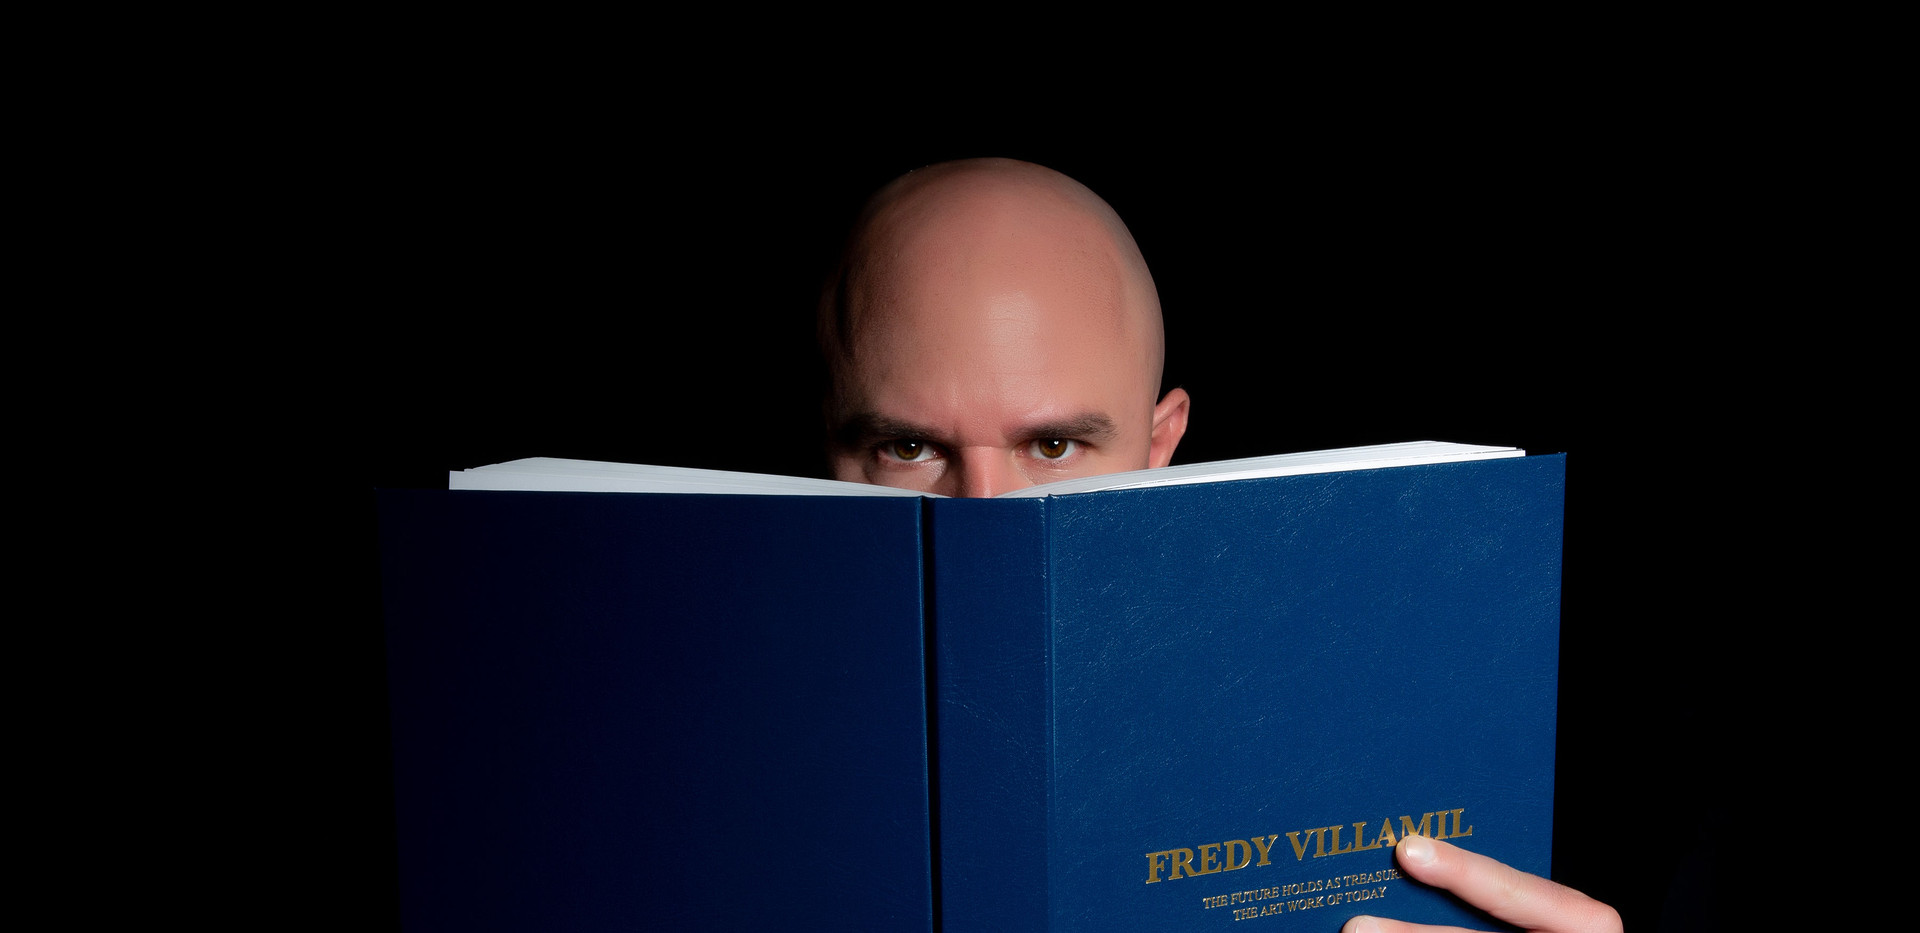 FREDY VILLAMIL BOOK